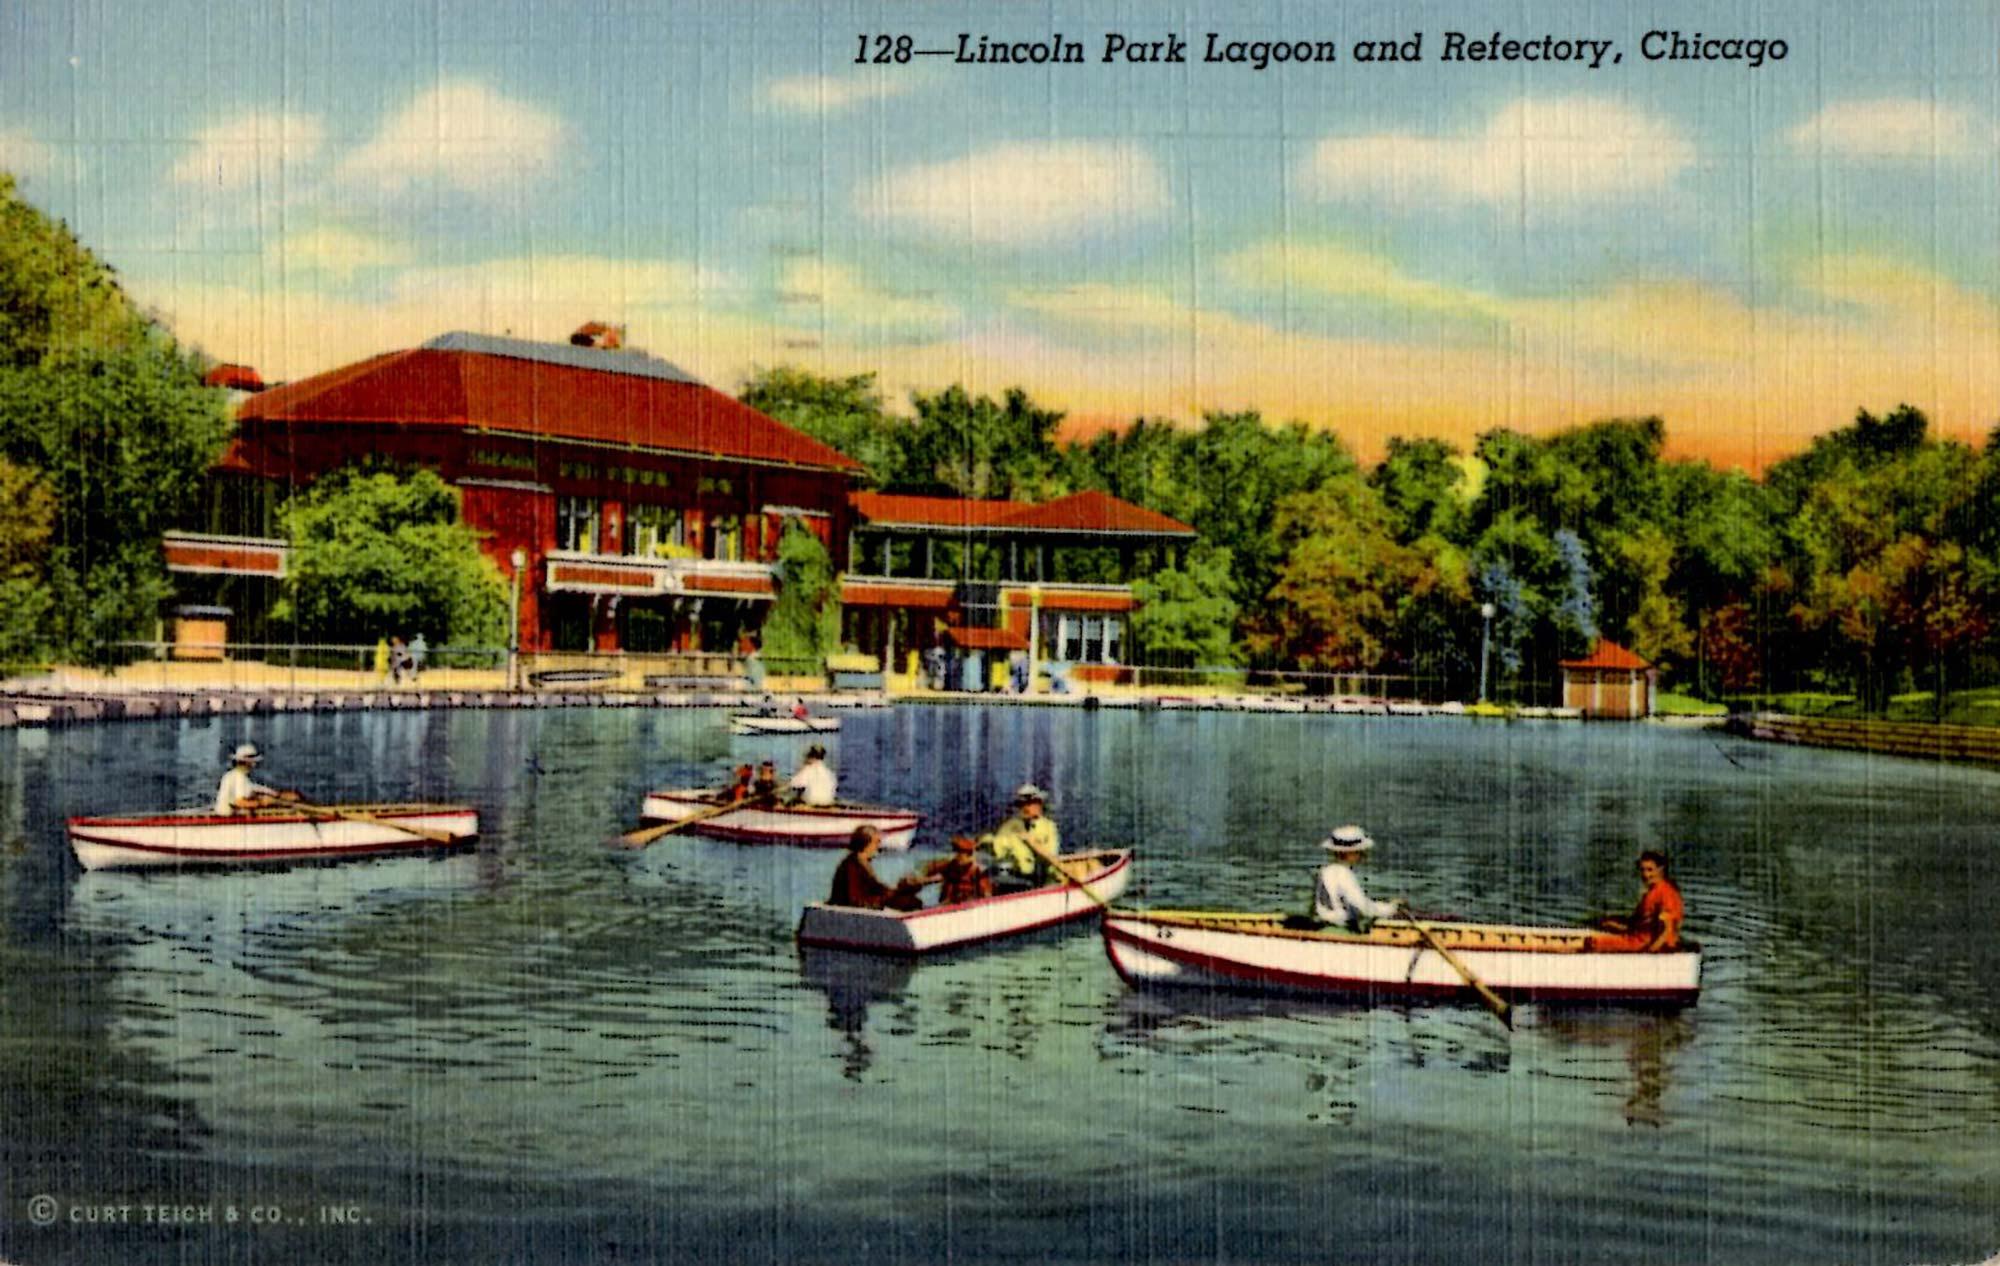 Postcard view Café Brauer (Lincoln Park Refectory), ca. 1940.